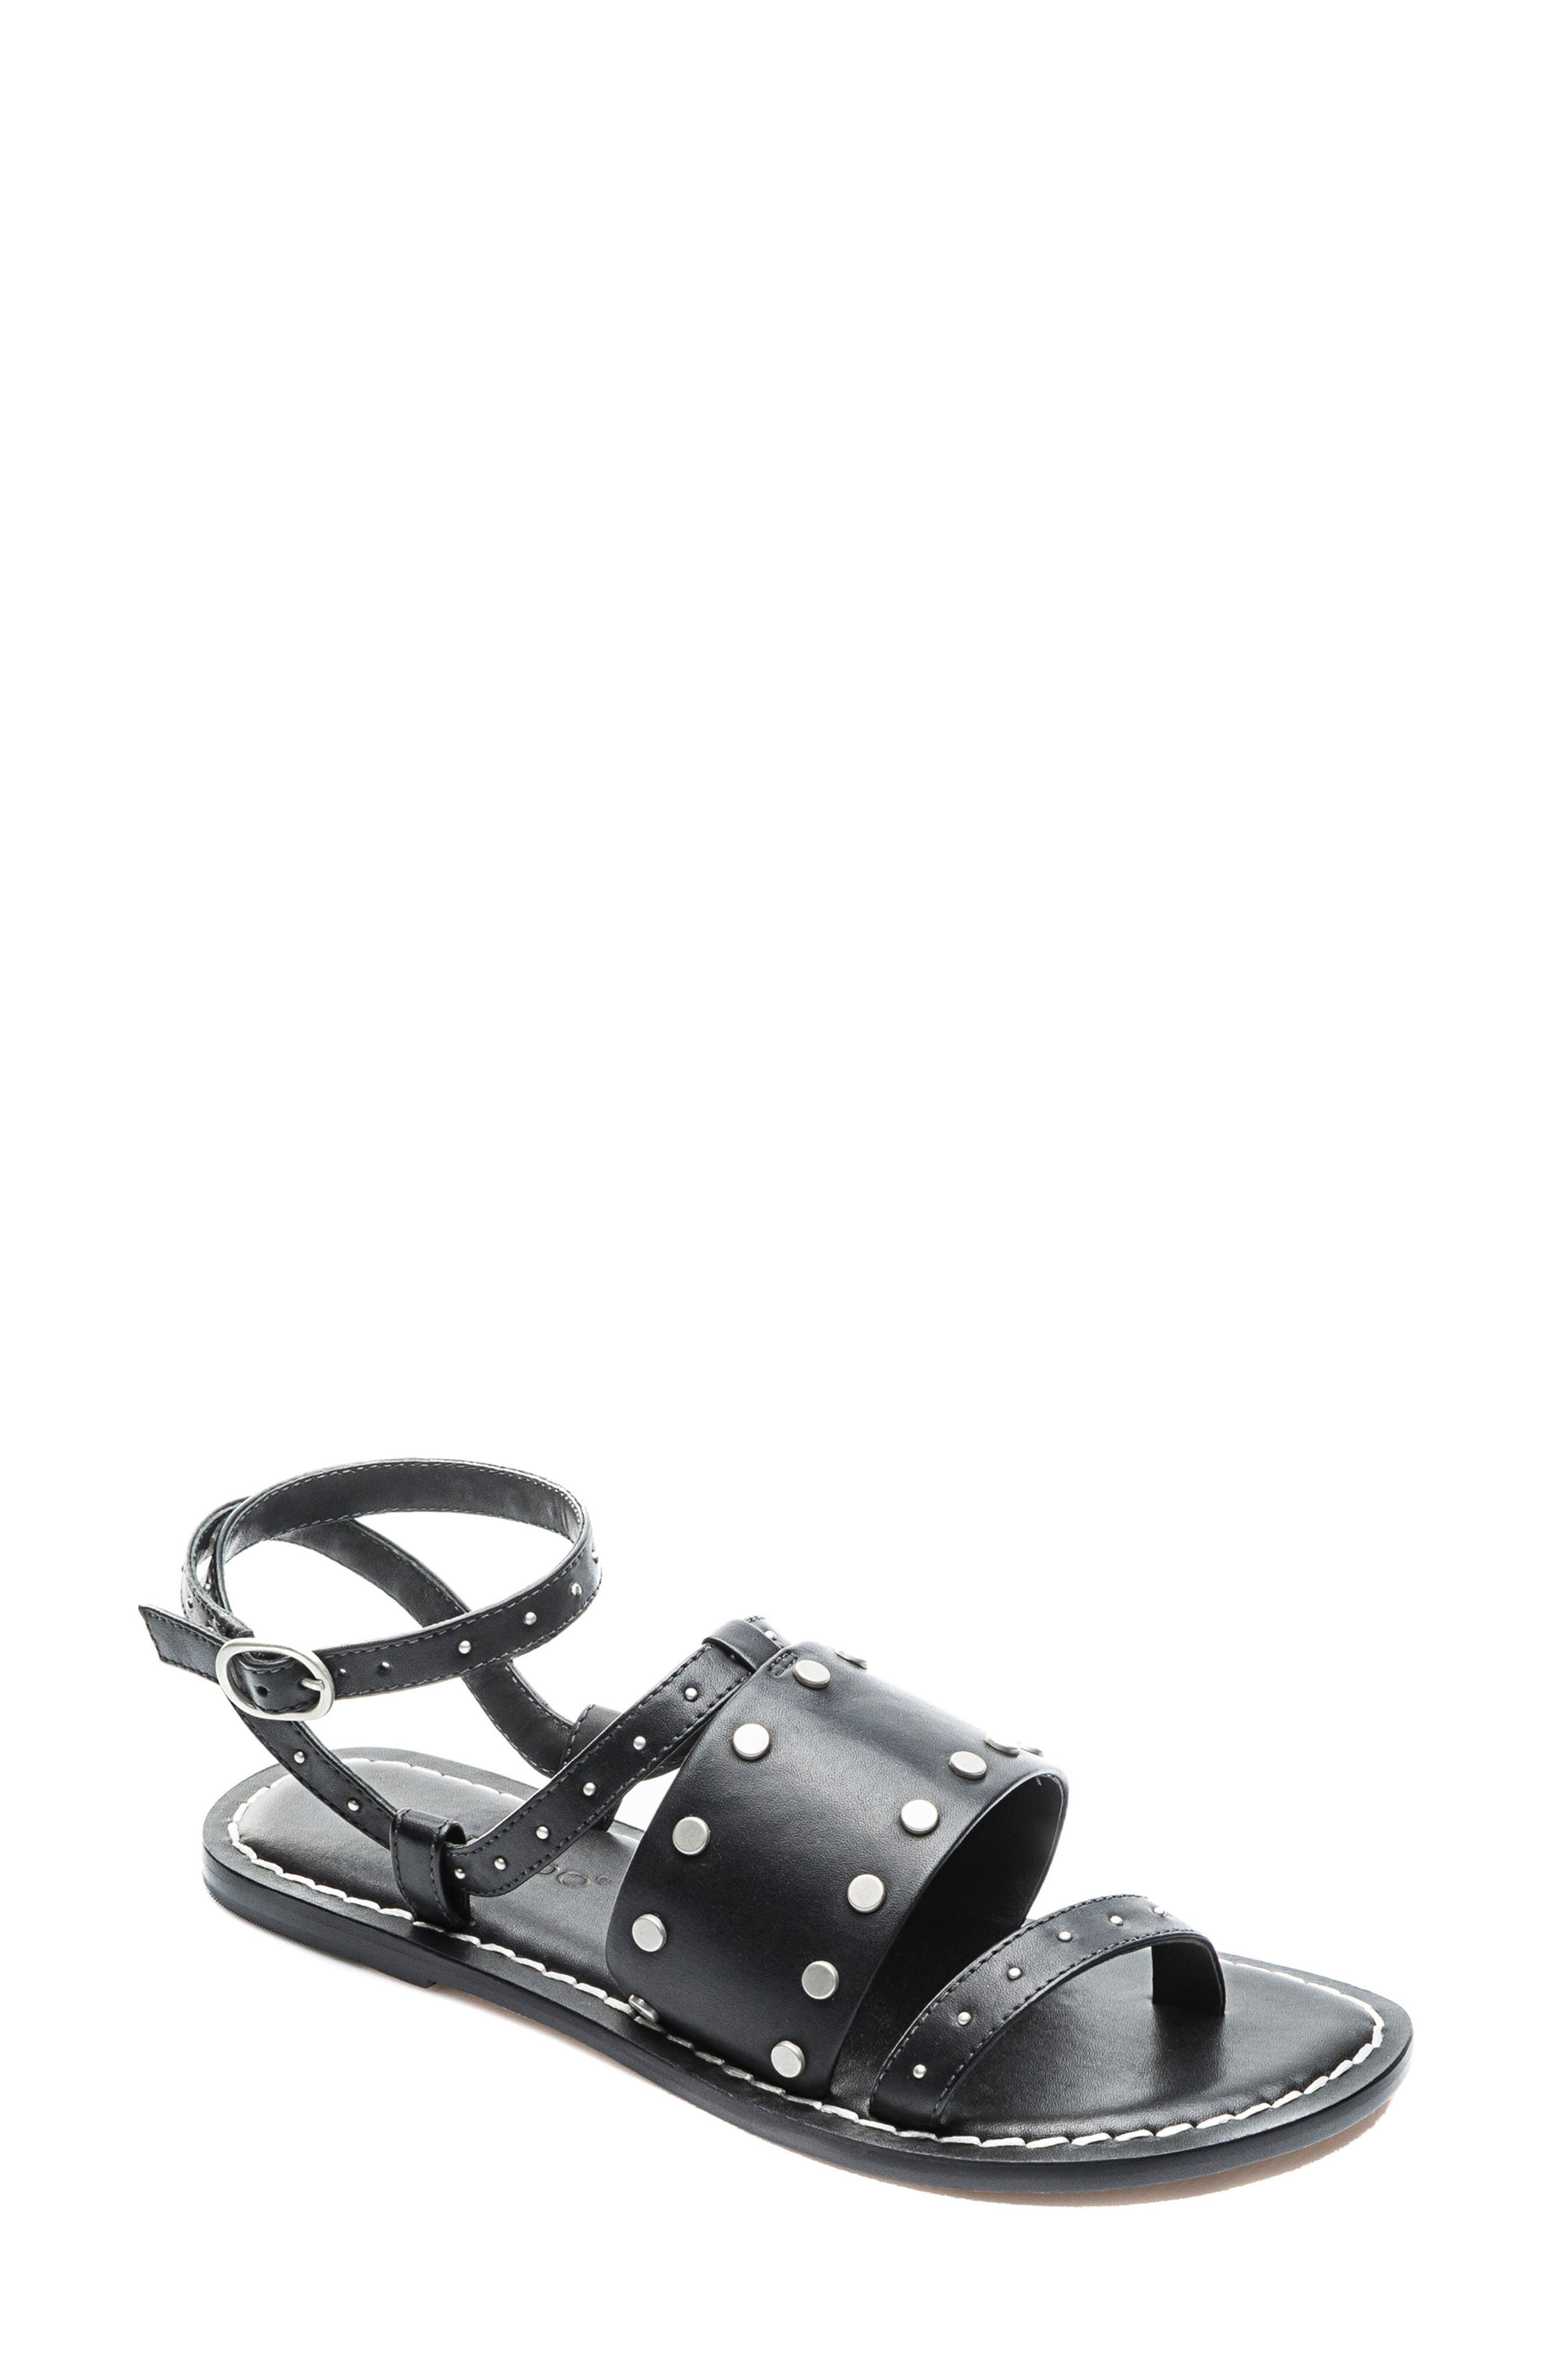 Bernardo Maisa Sandal,                         Main,                         color, Black Leather